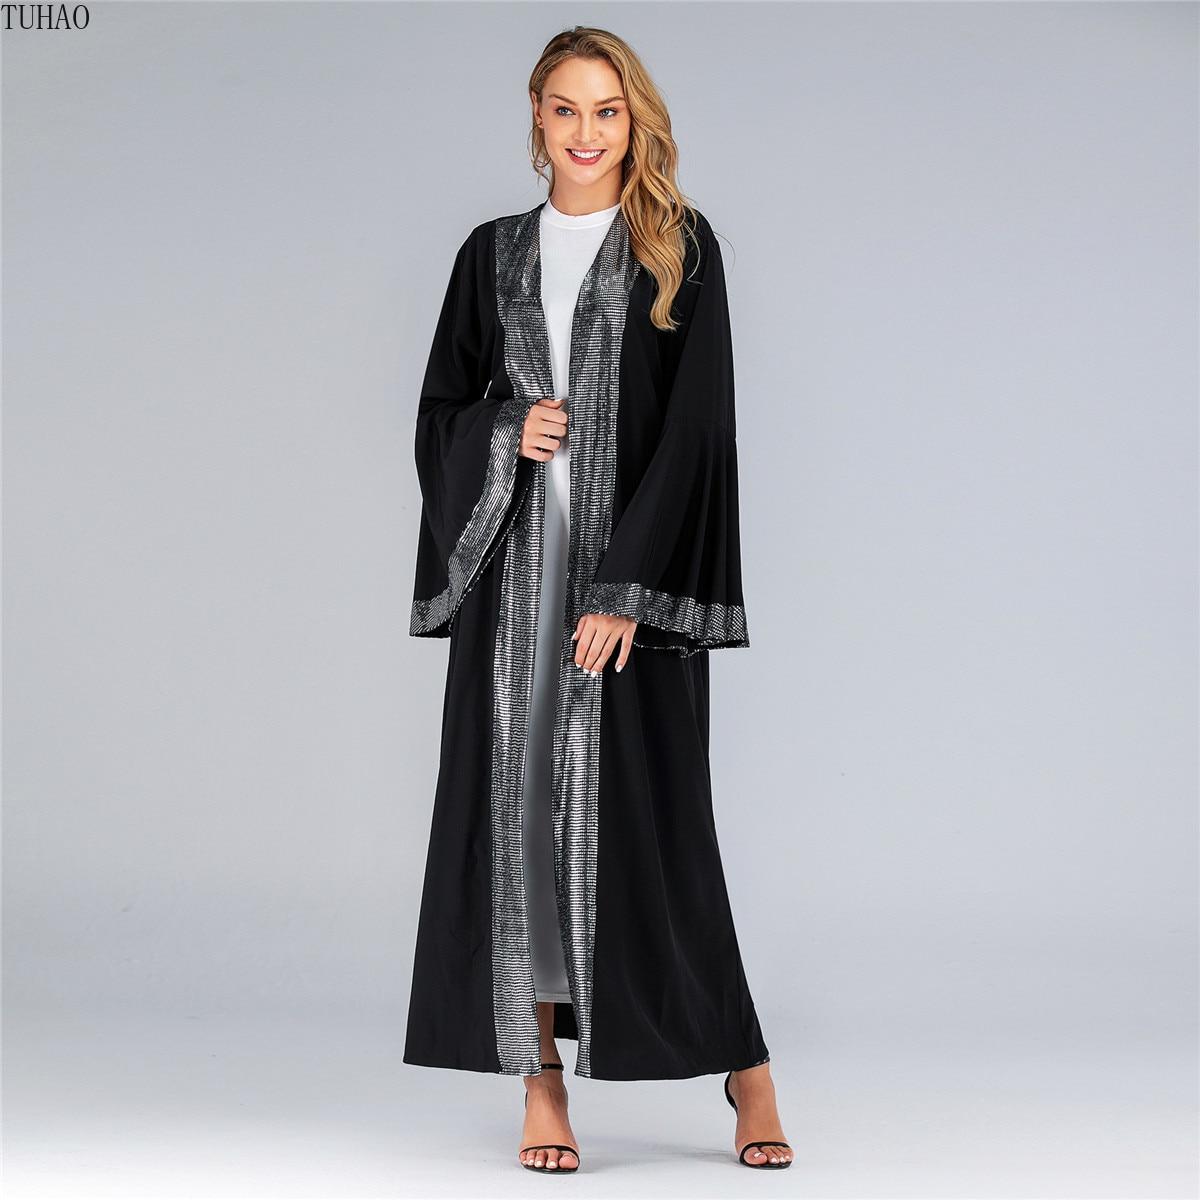 Otoño Invierno musulmana de lujo abrigos largos mujer brillante mangas mariposa Dubai túnicas árabes Femme con lentejuelas gabardina T1715